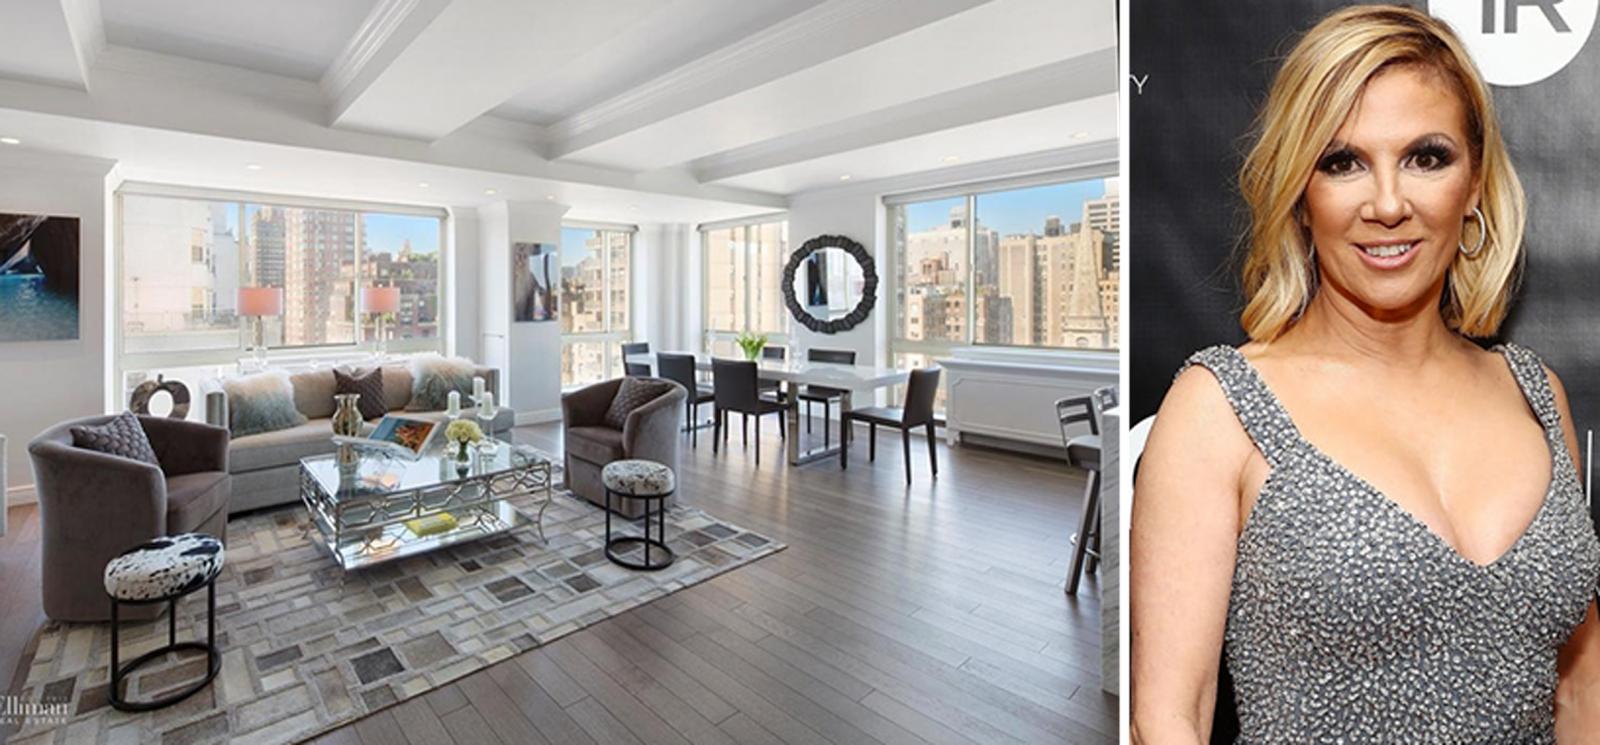 Image Of Ramona Singer Apartment